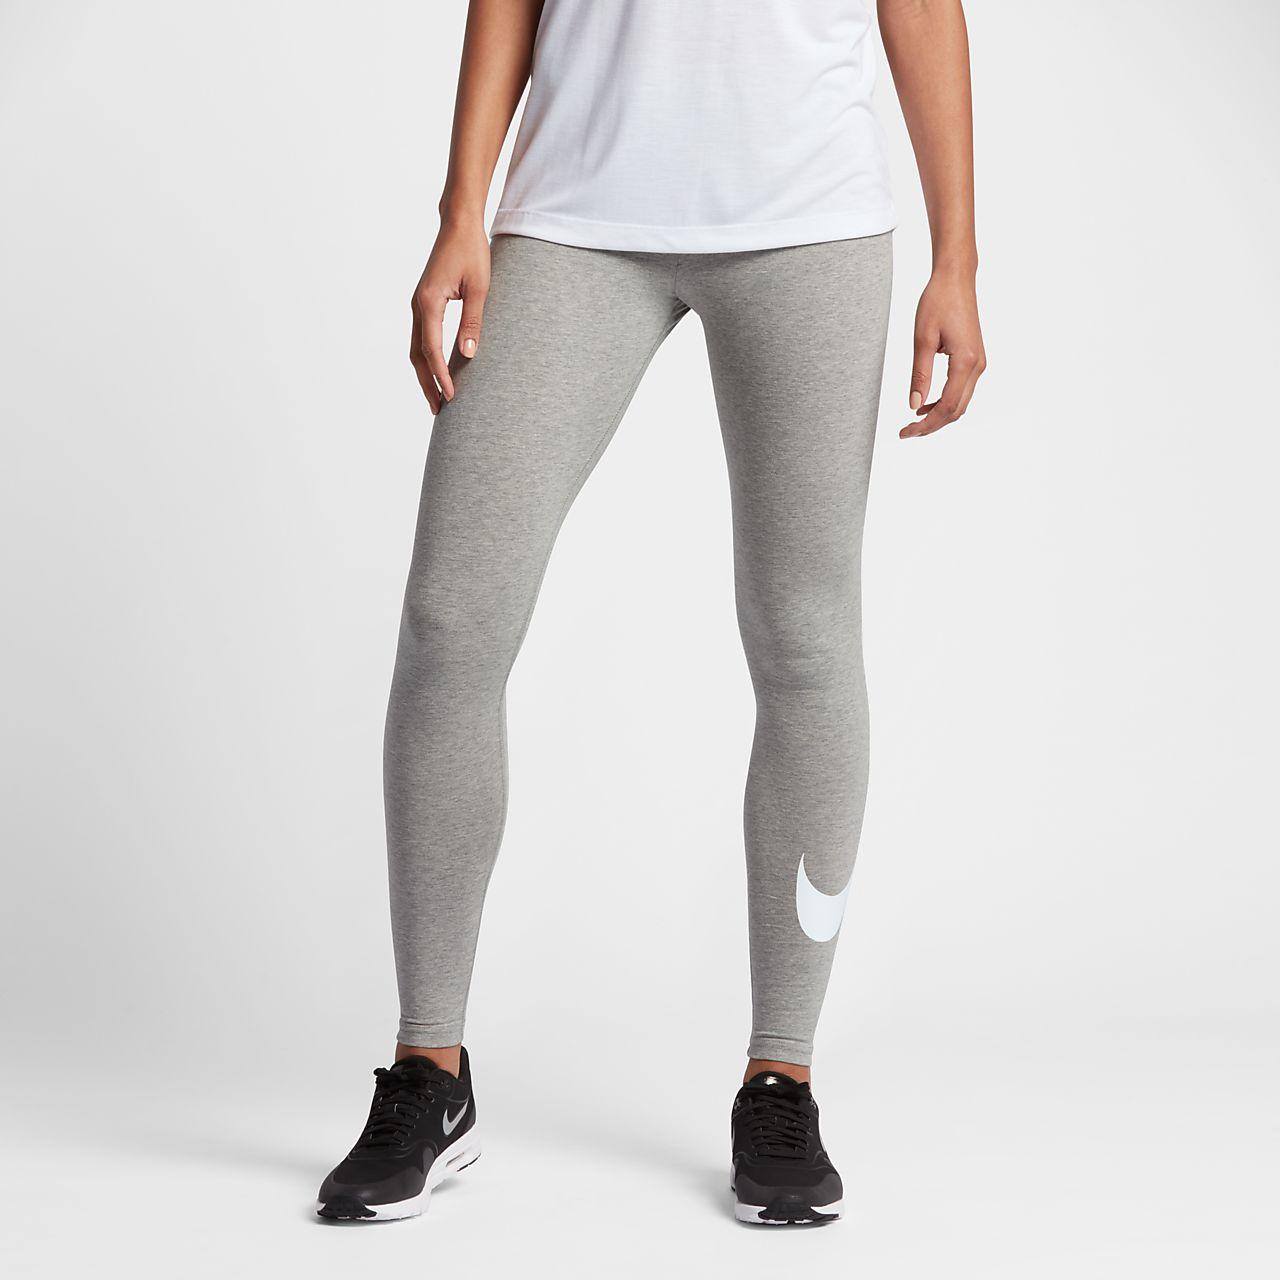 00b4d6744e12 Low Resolution Dámské legíny Nike Sportswear Swoosh Dámské legíny Nike  Sportswear Swoosh